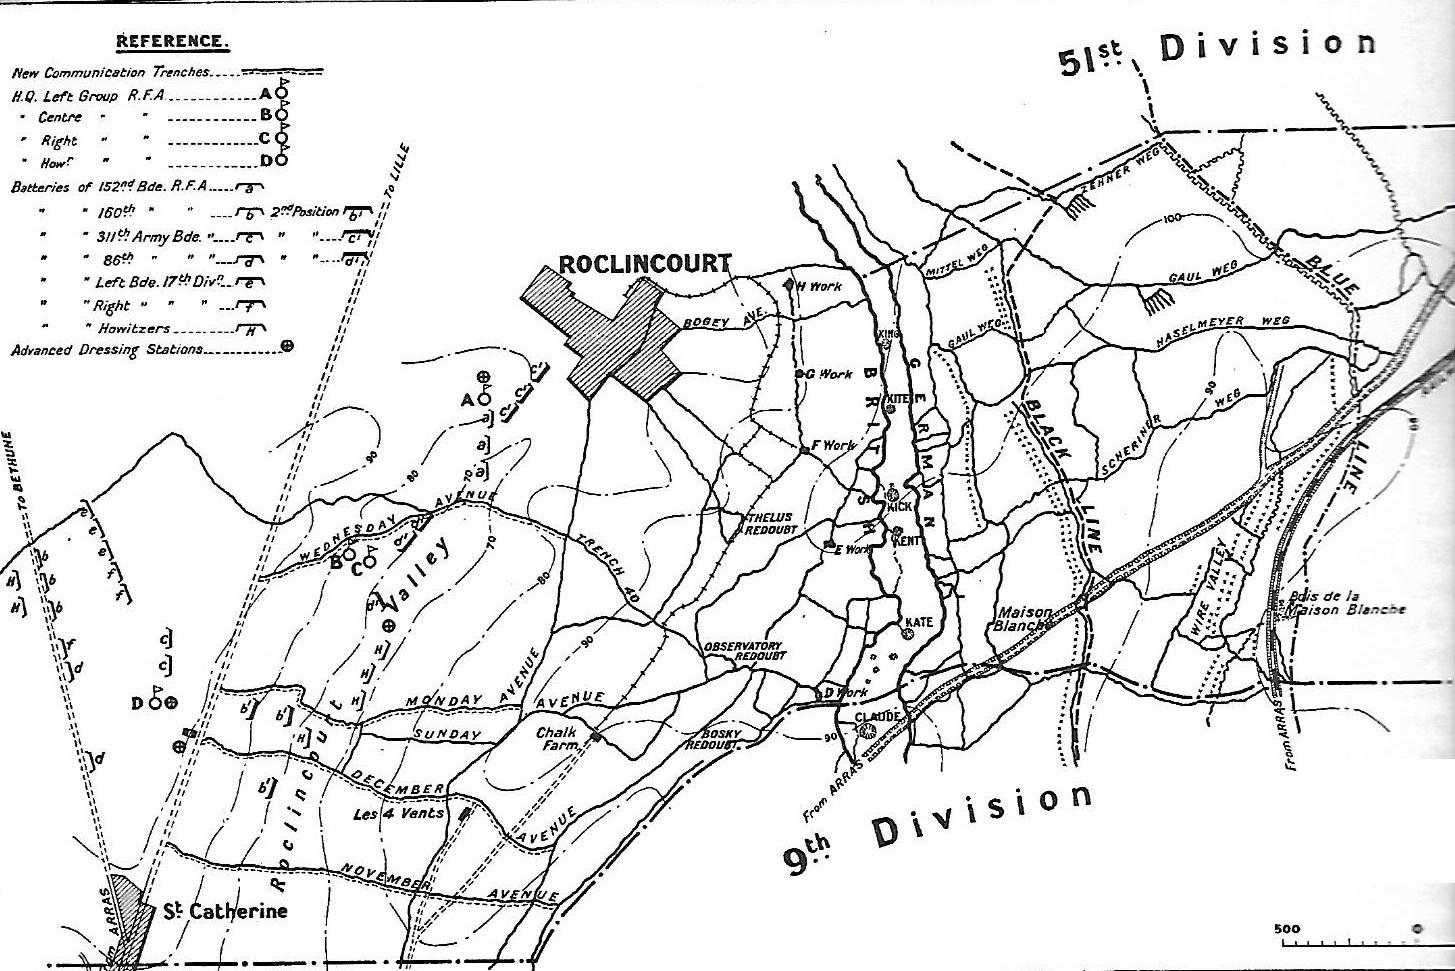 Northumbrian Gunner Arras